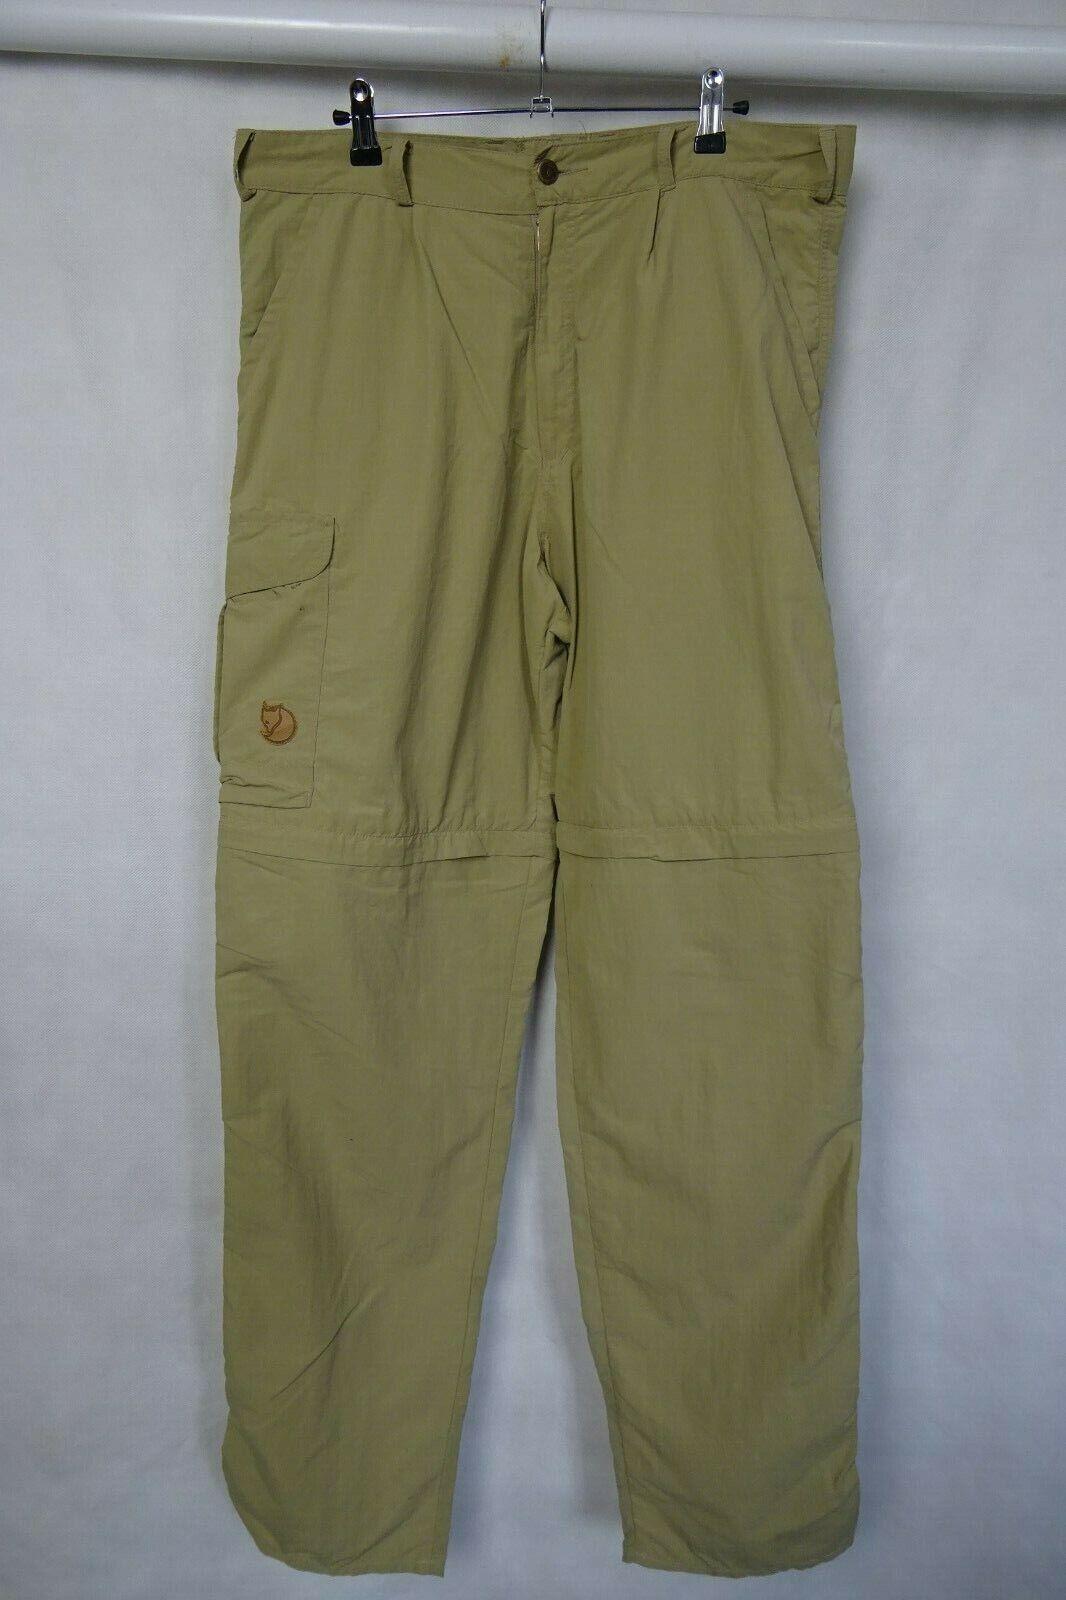 Uomo Fjällräven Outdoor Zip-Off Pantaloni Pants Pants Pants W36 L34 6a434e